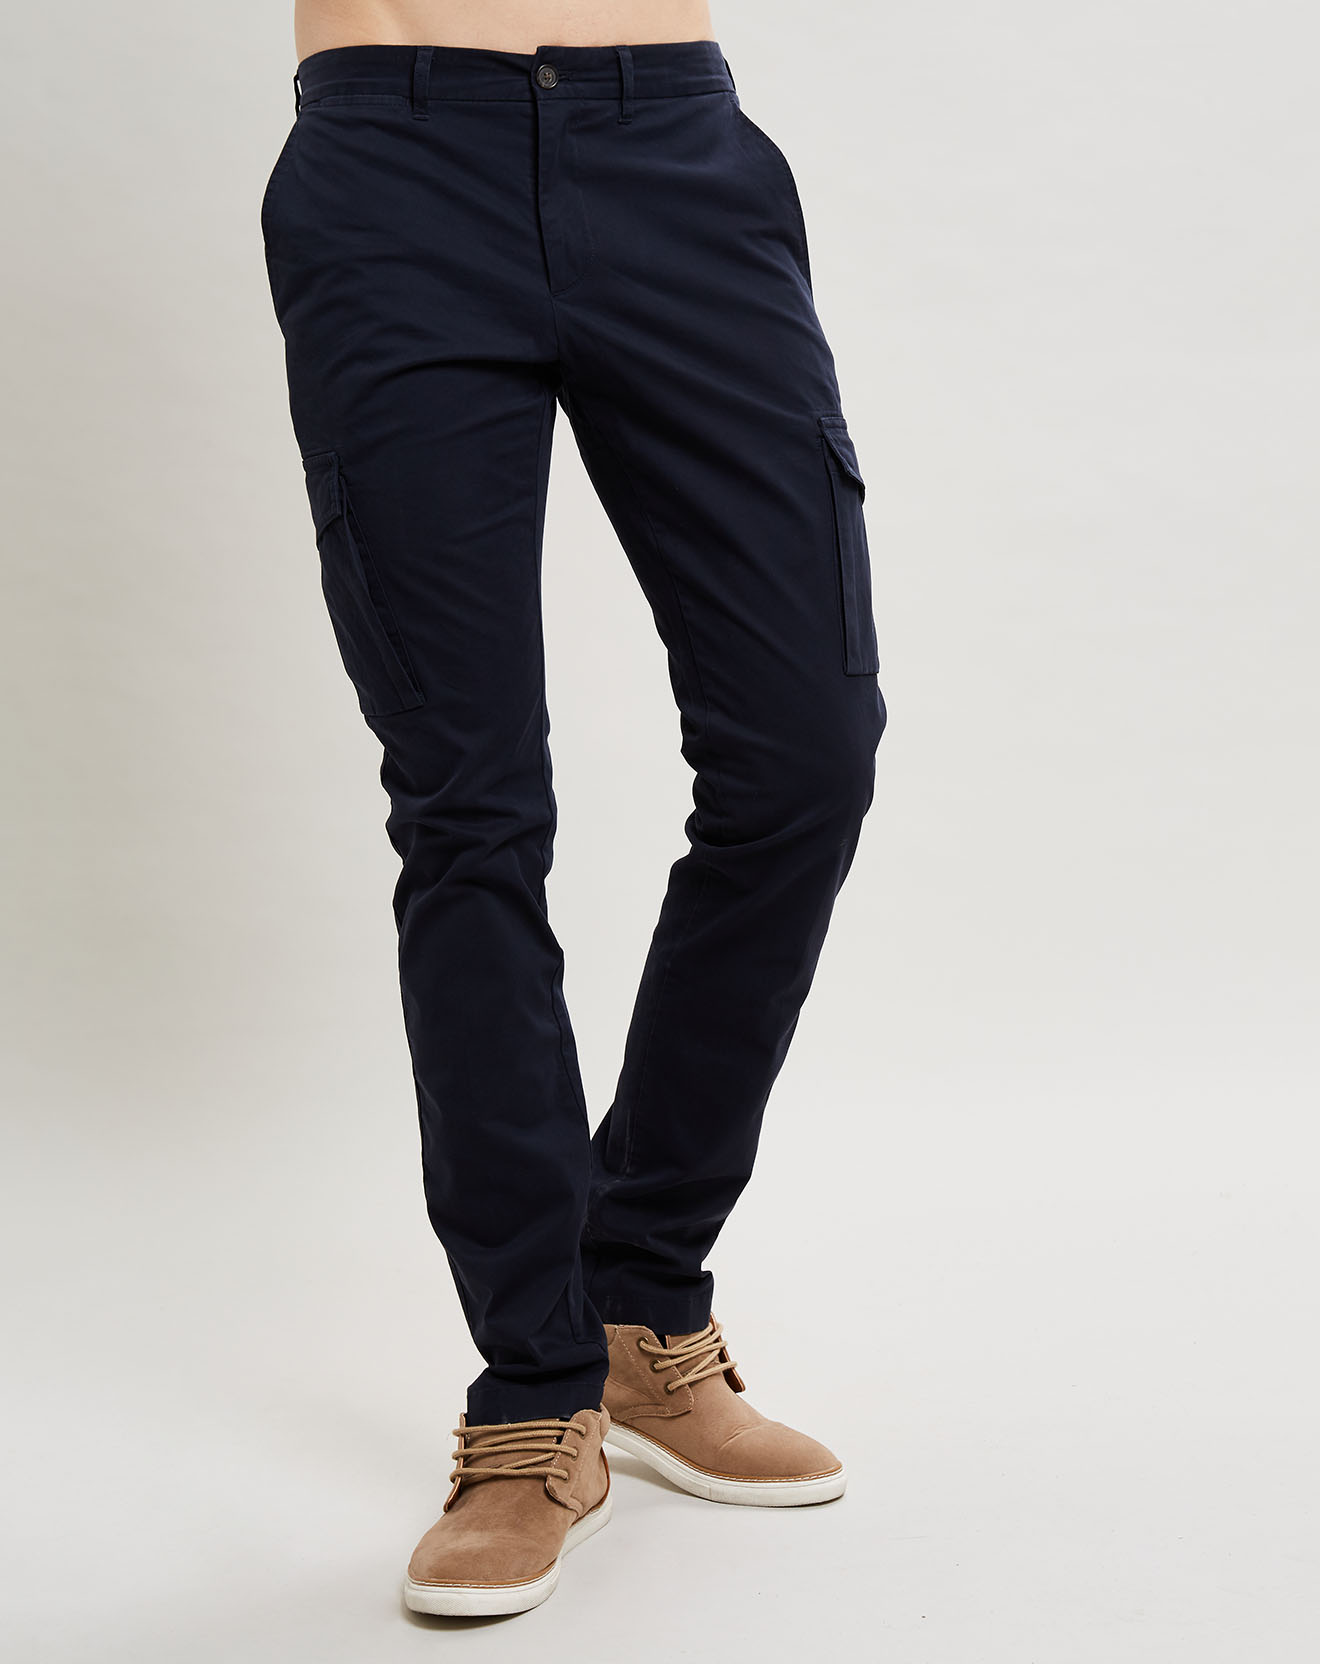 Pantalon Slim Fit Uni 6 Poches bleu foncé - Façonnable - Modalova